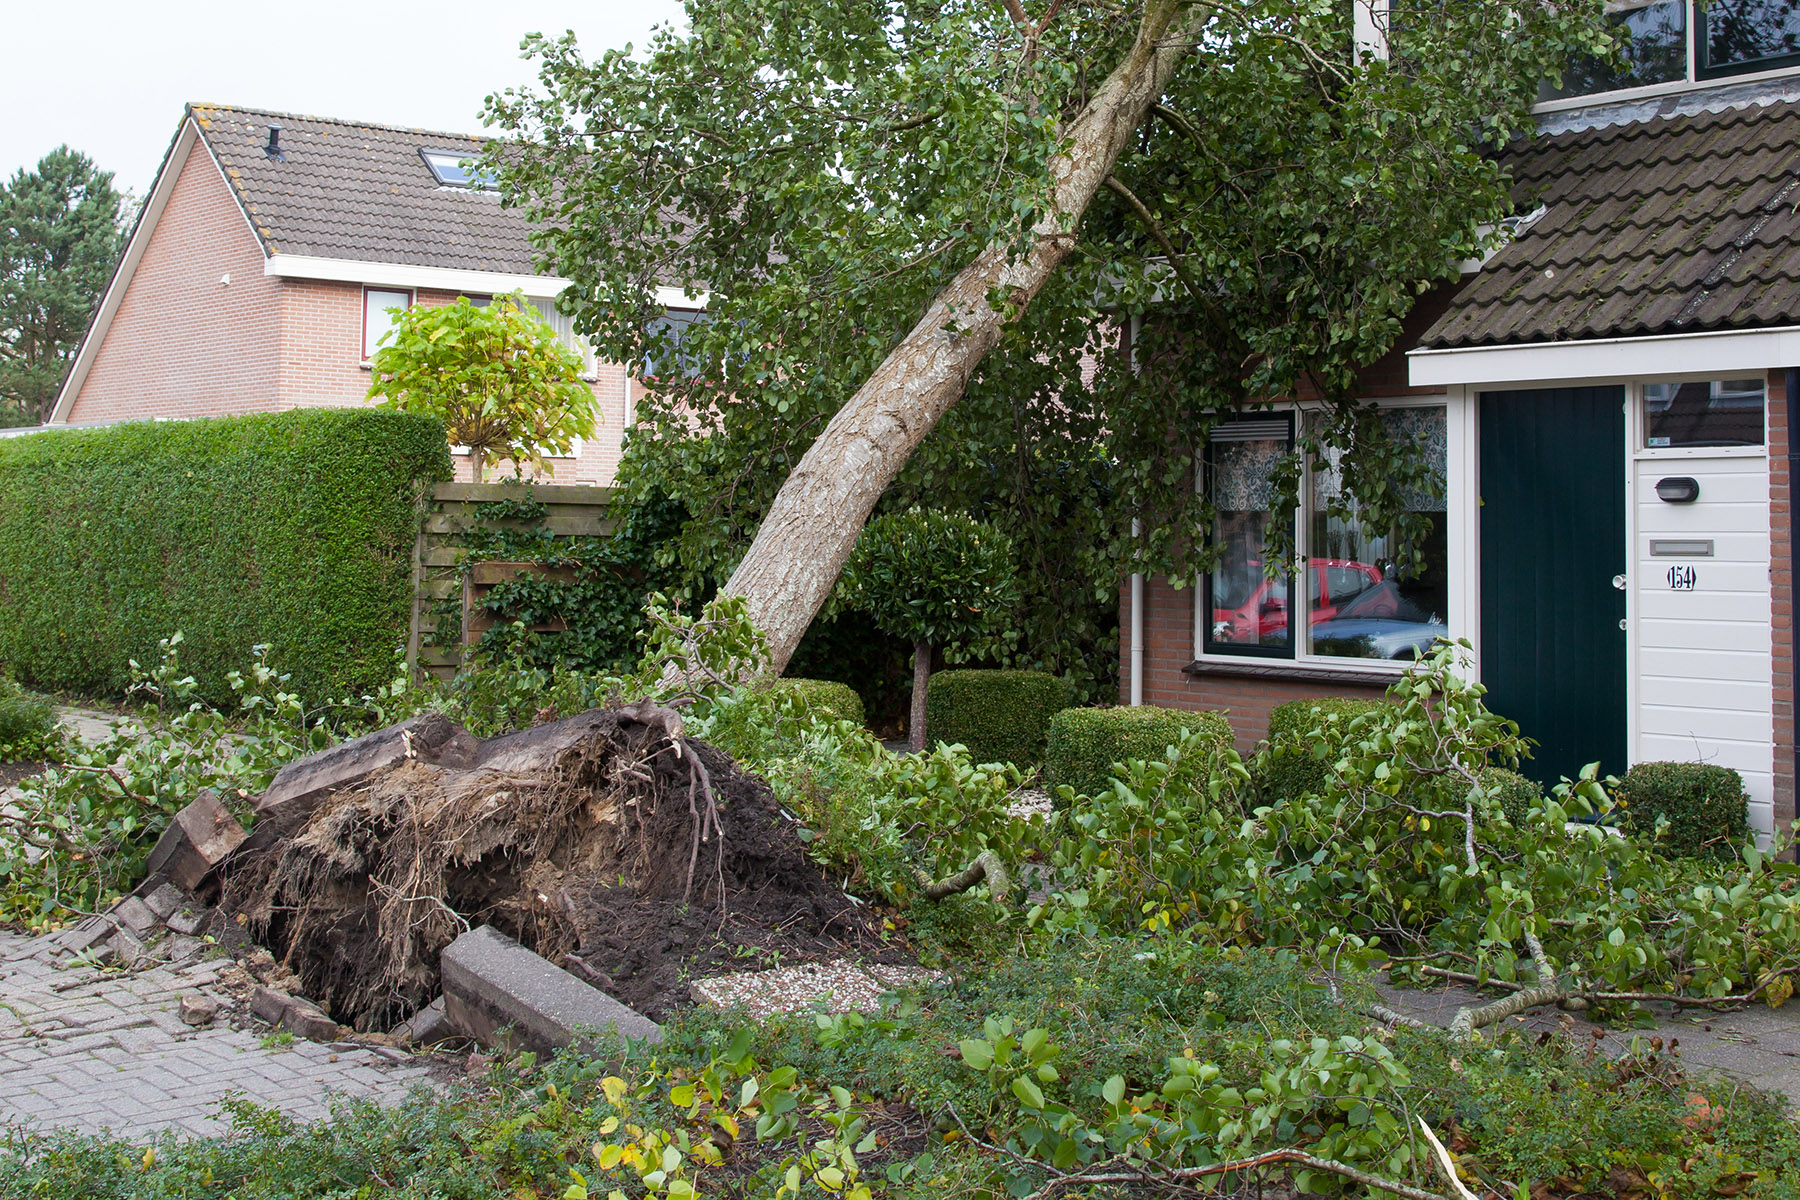 Storm-damaged home in Leeuwarden